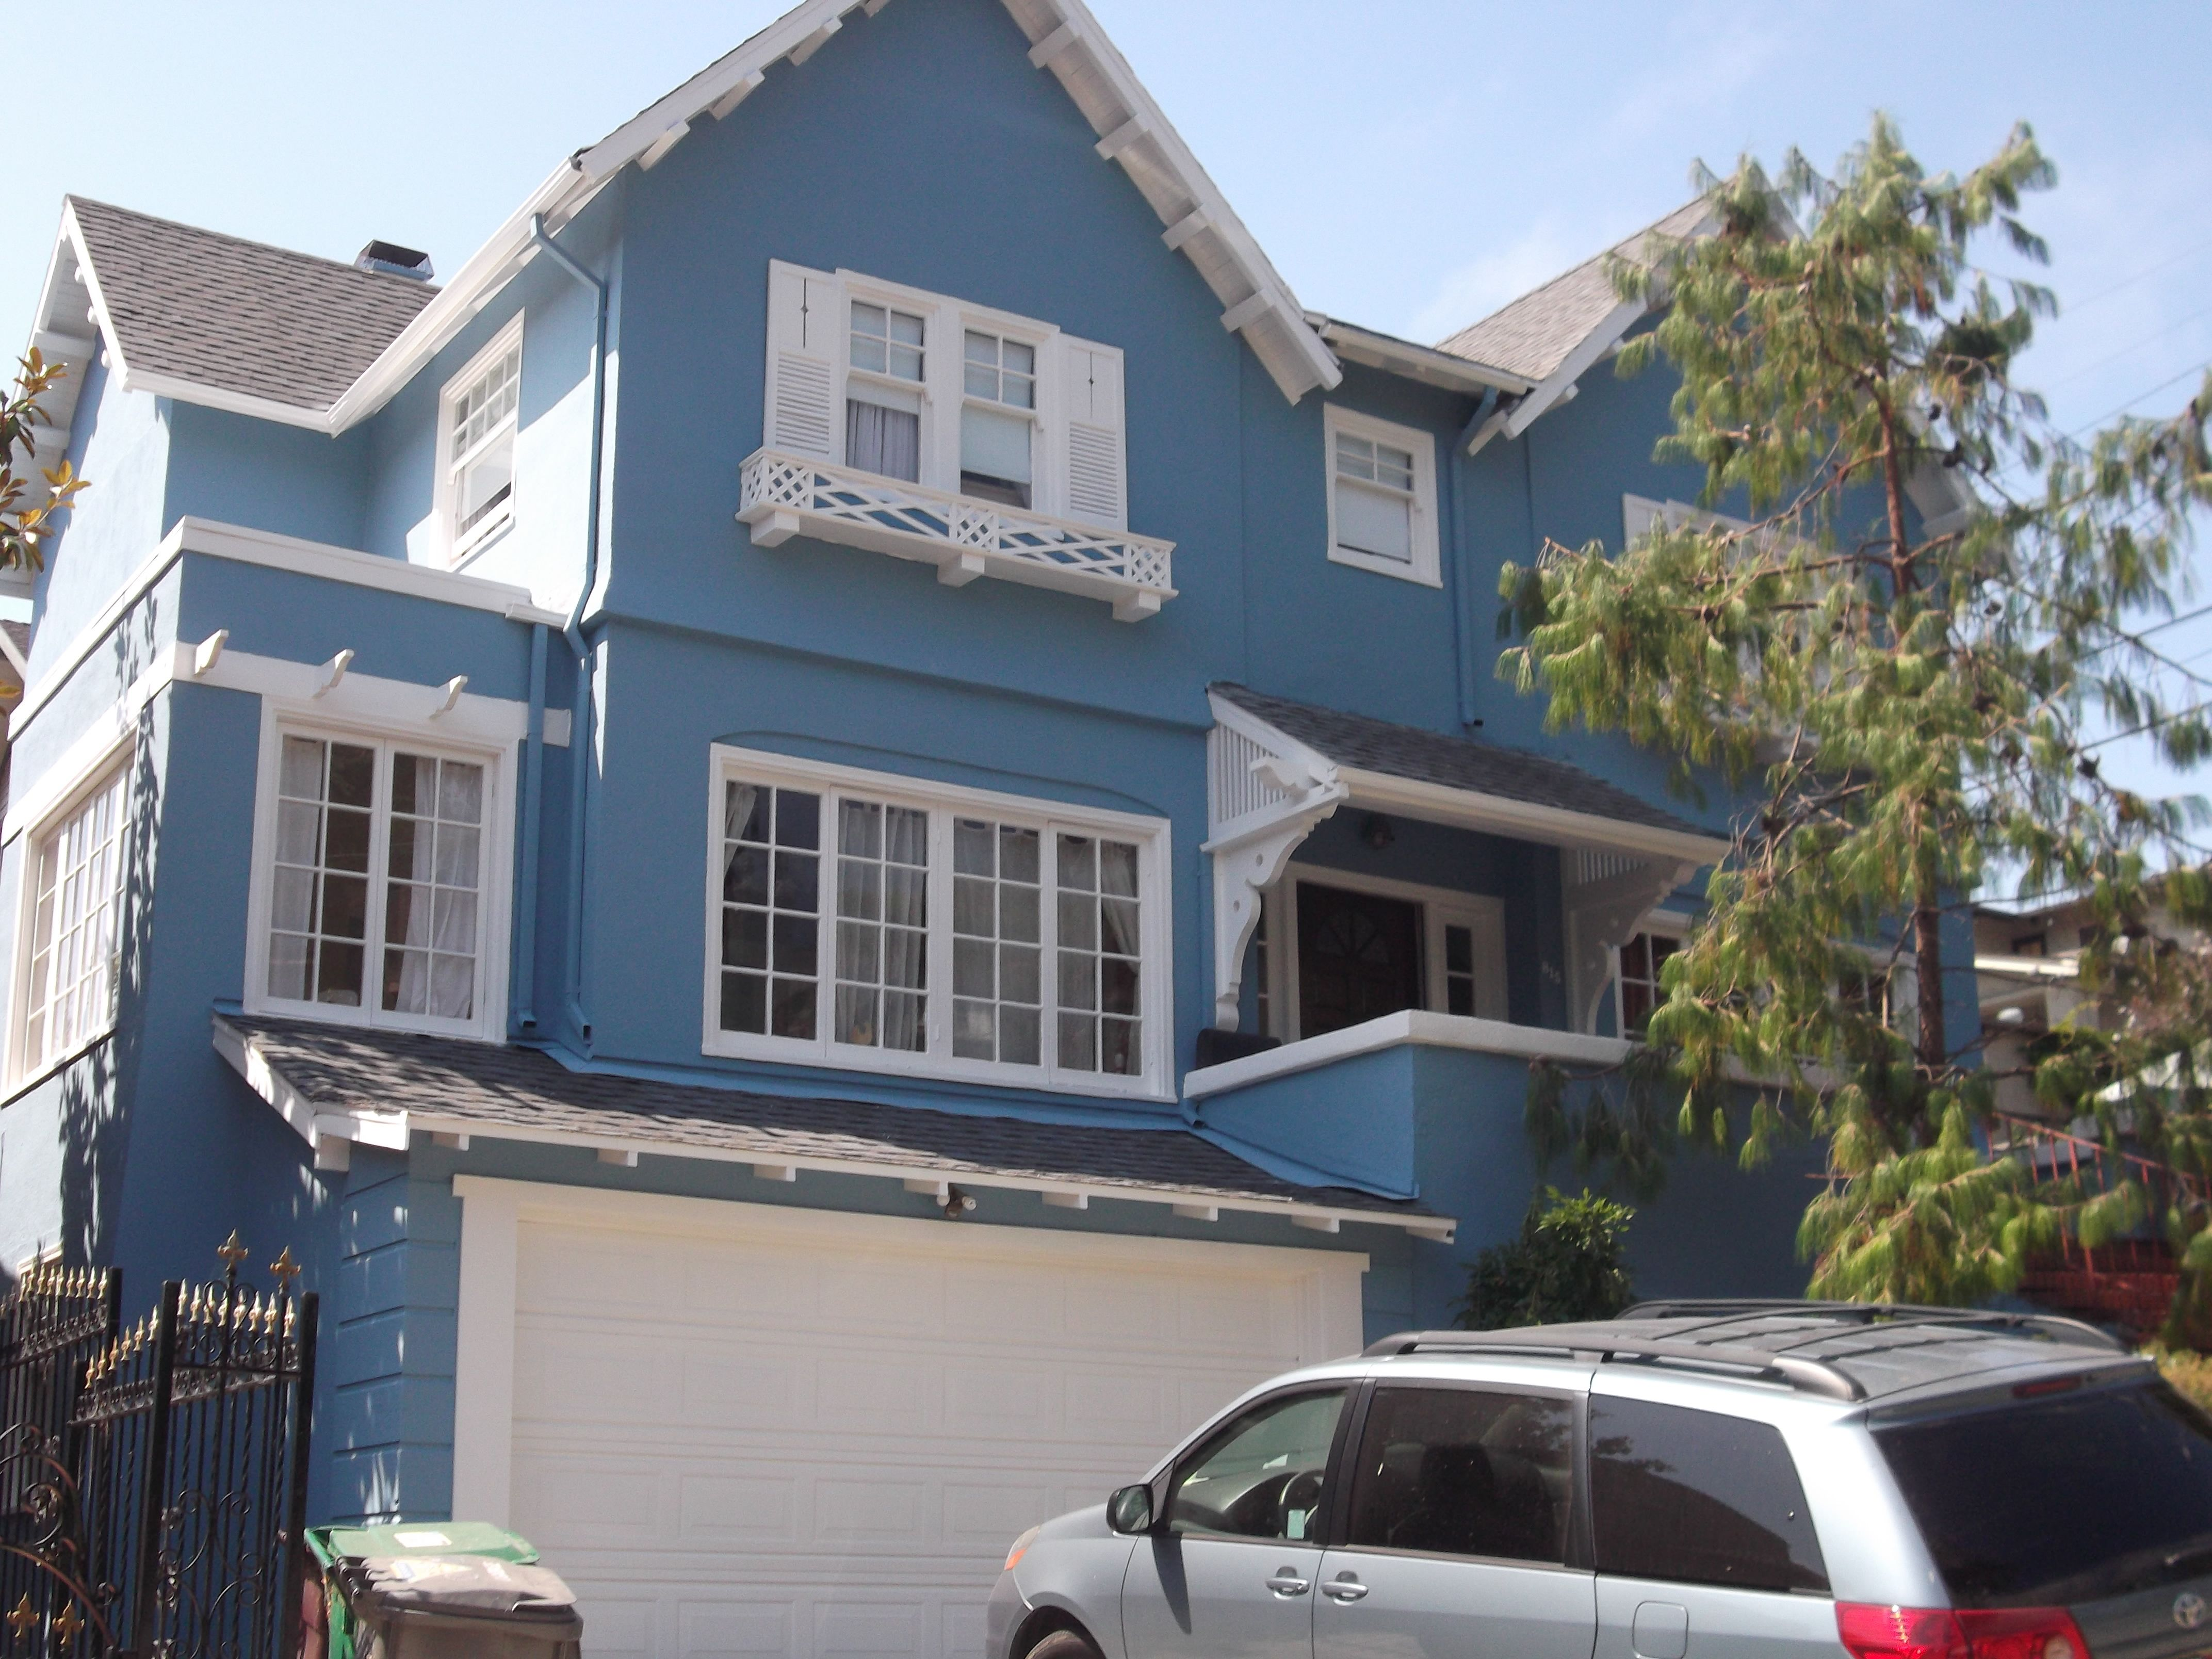 Exterior: Modern Exterior Brick Paint House Design With Yard Plan ...